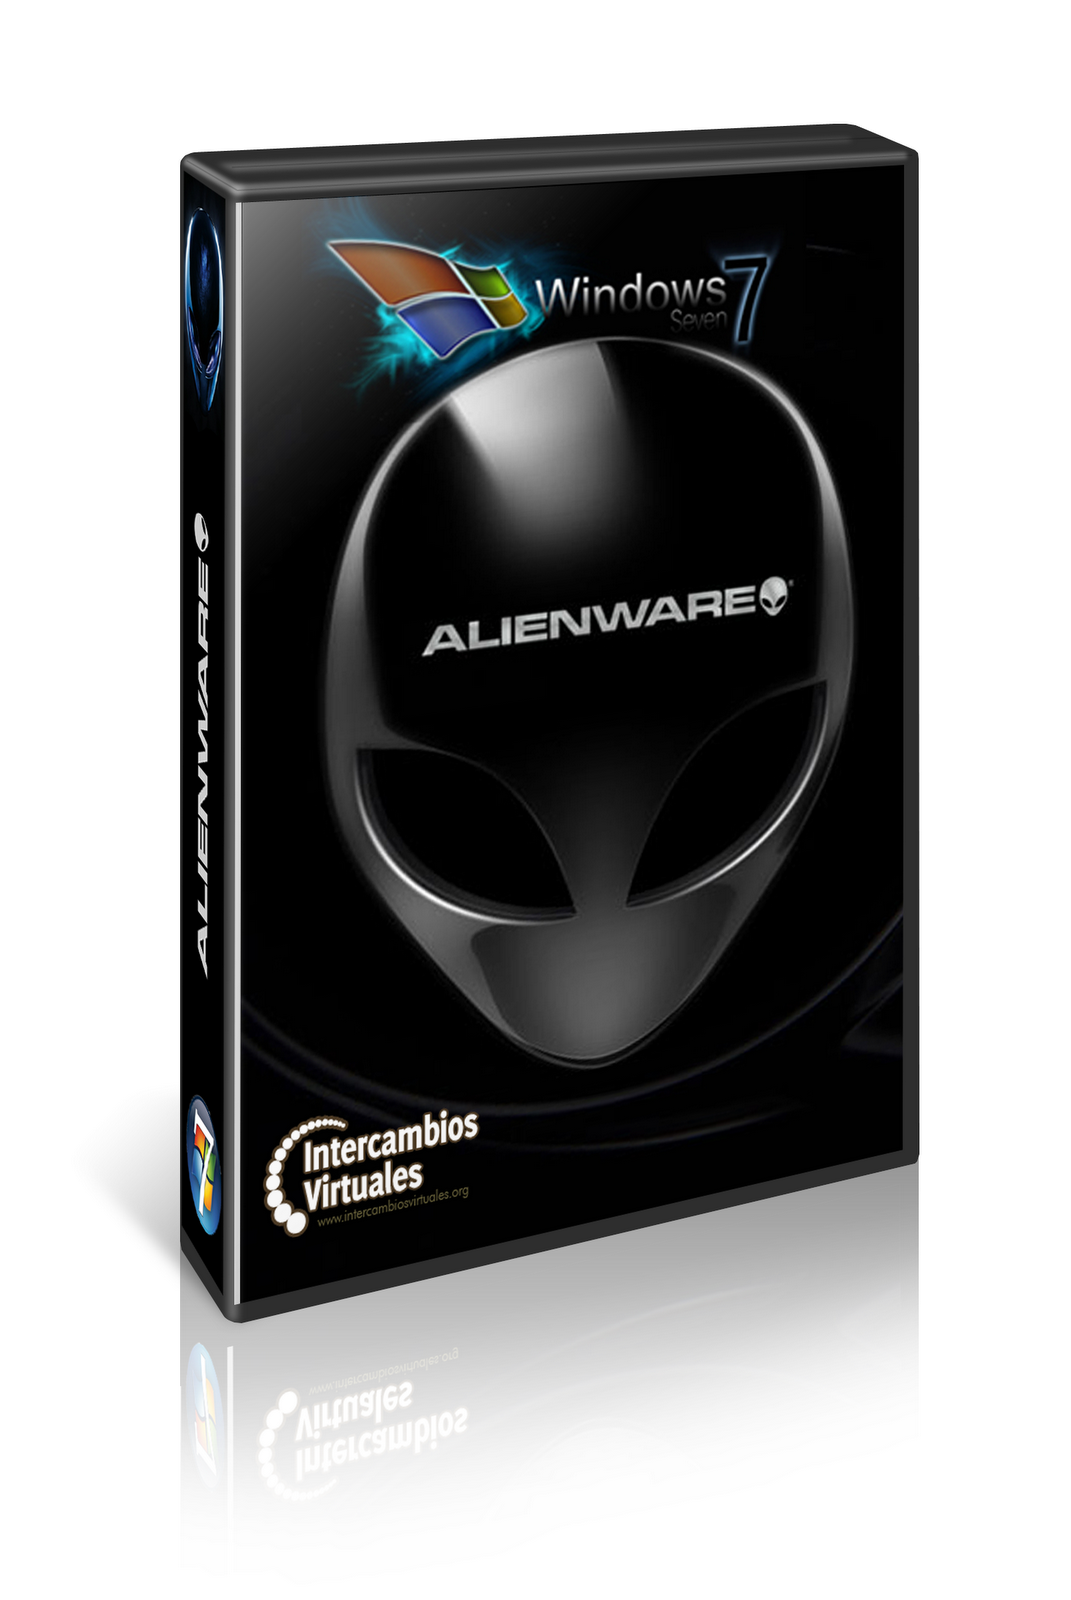 http://4.bp.blogspot.com/_1IotXdNNWlc/THNBE3hzvdI/AAAAAAAAAB8/pBlKDXICZzM/s1600/cover+aliens.png